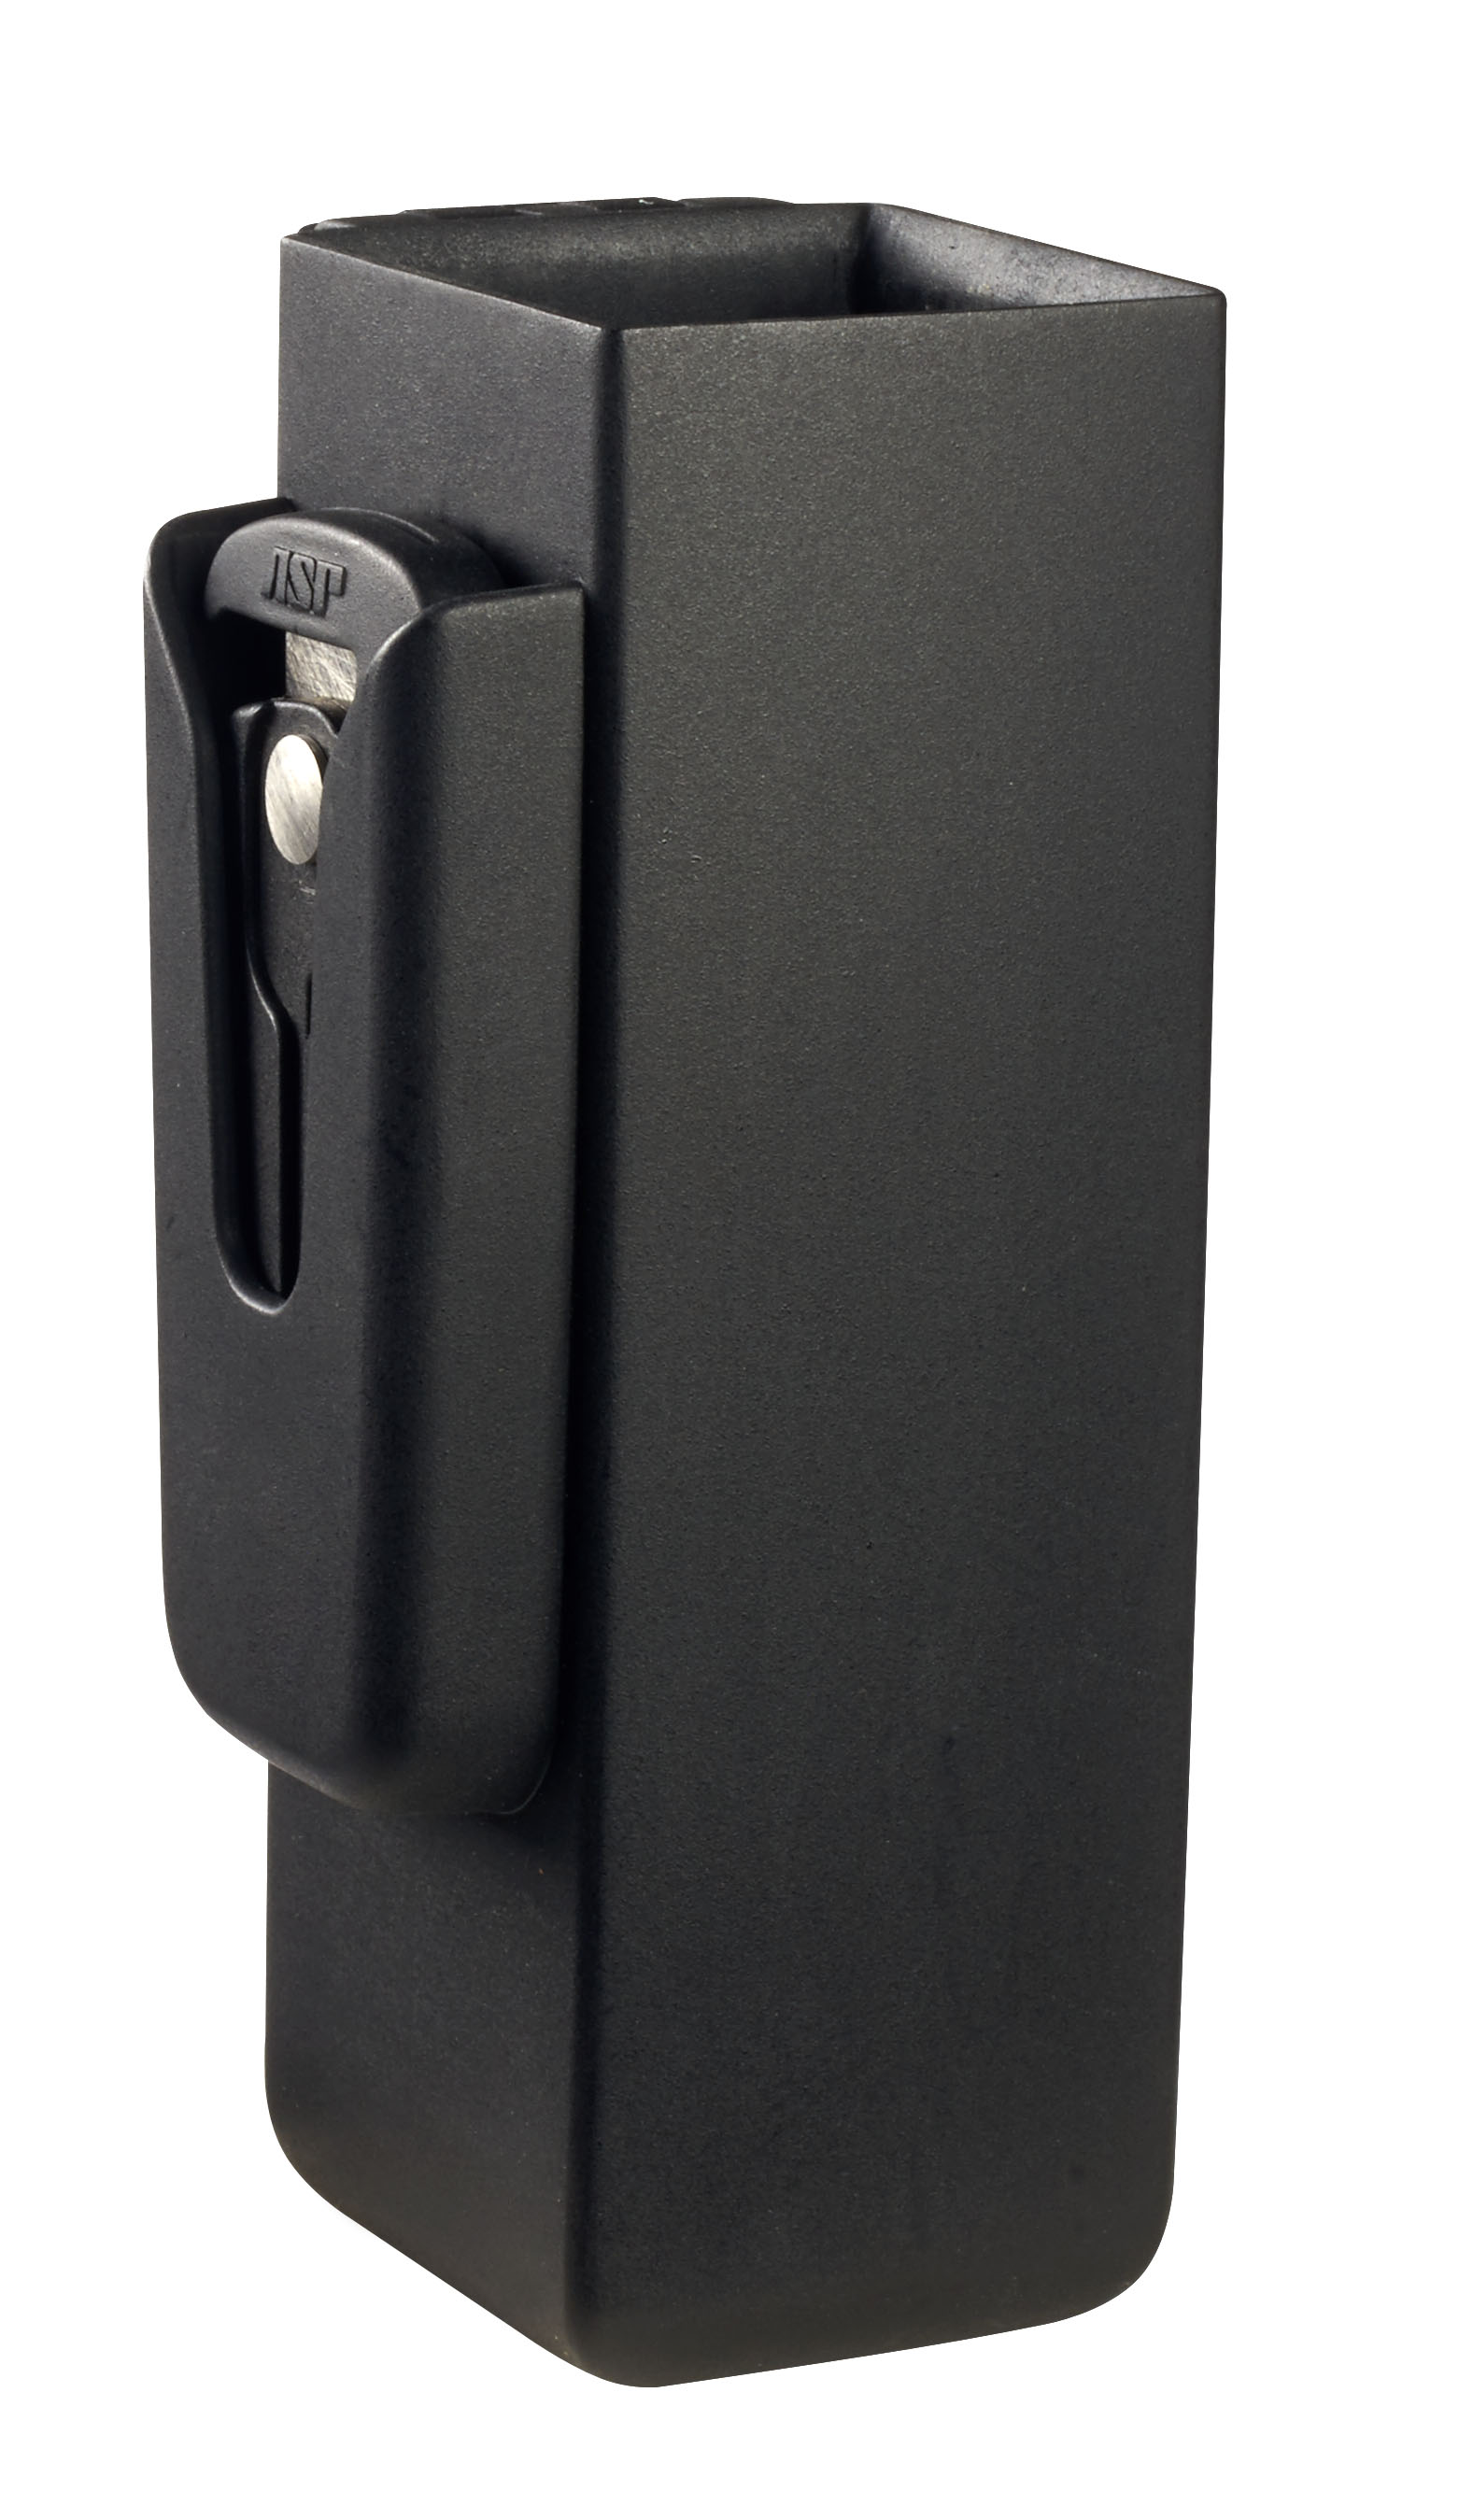 ASP Holster für Einmalfesseln & Cutter - Tri-Fold & Scarab Case 56226